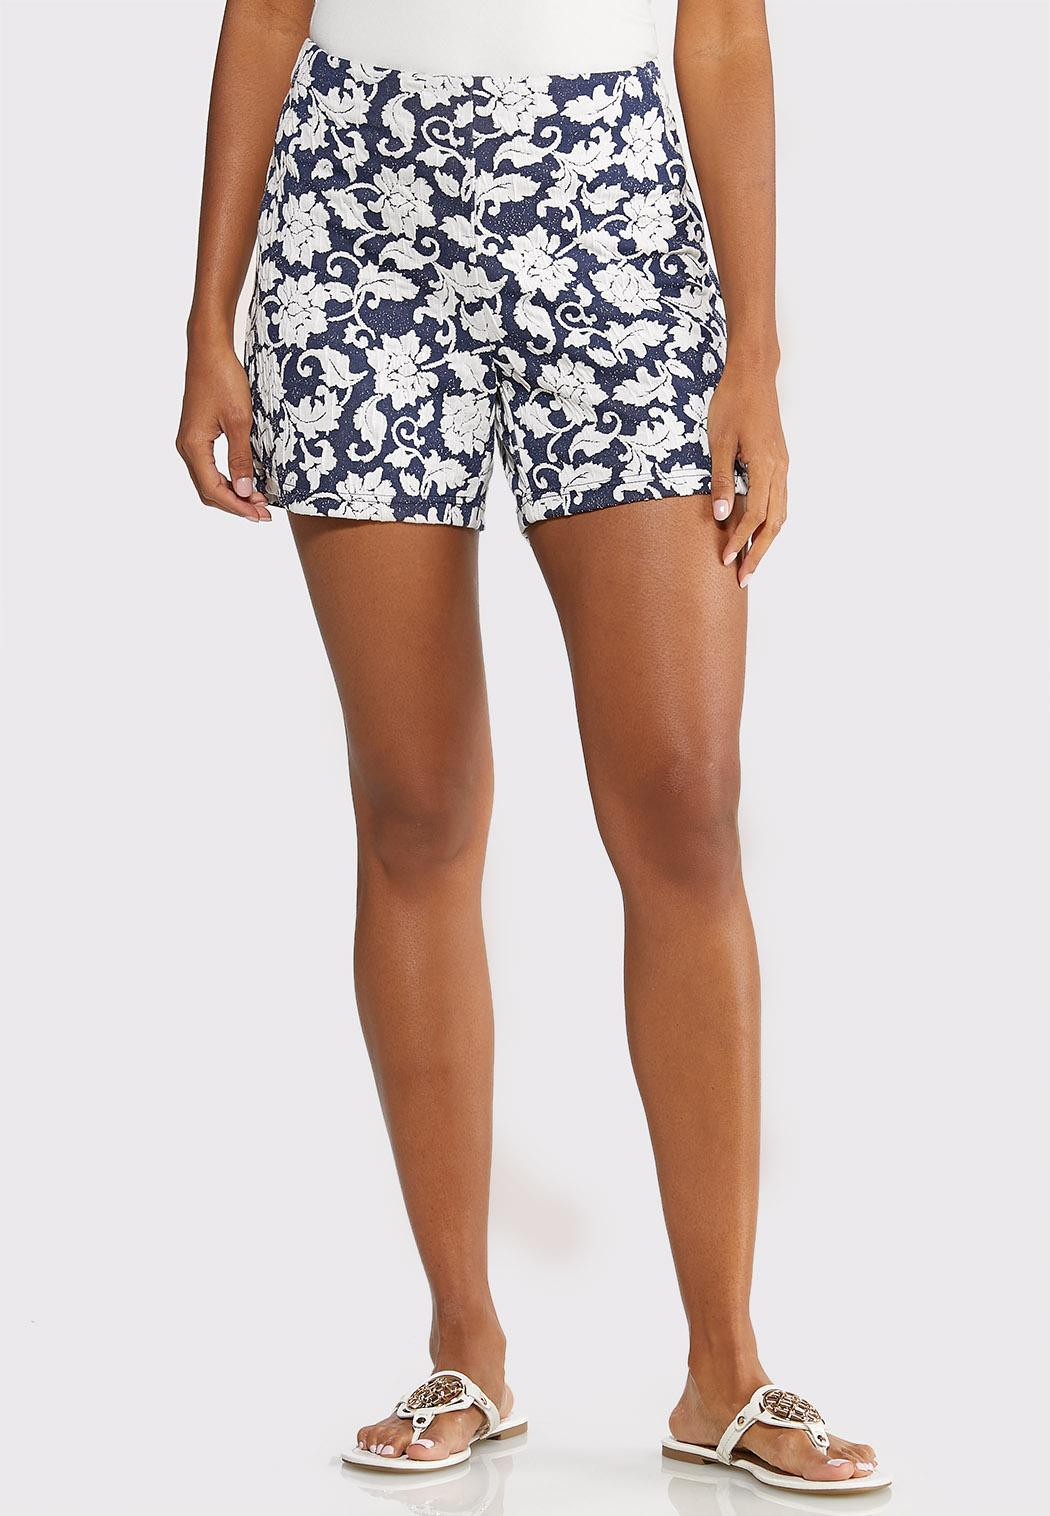 6afa6ed7 Women's Shorts